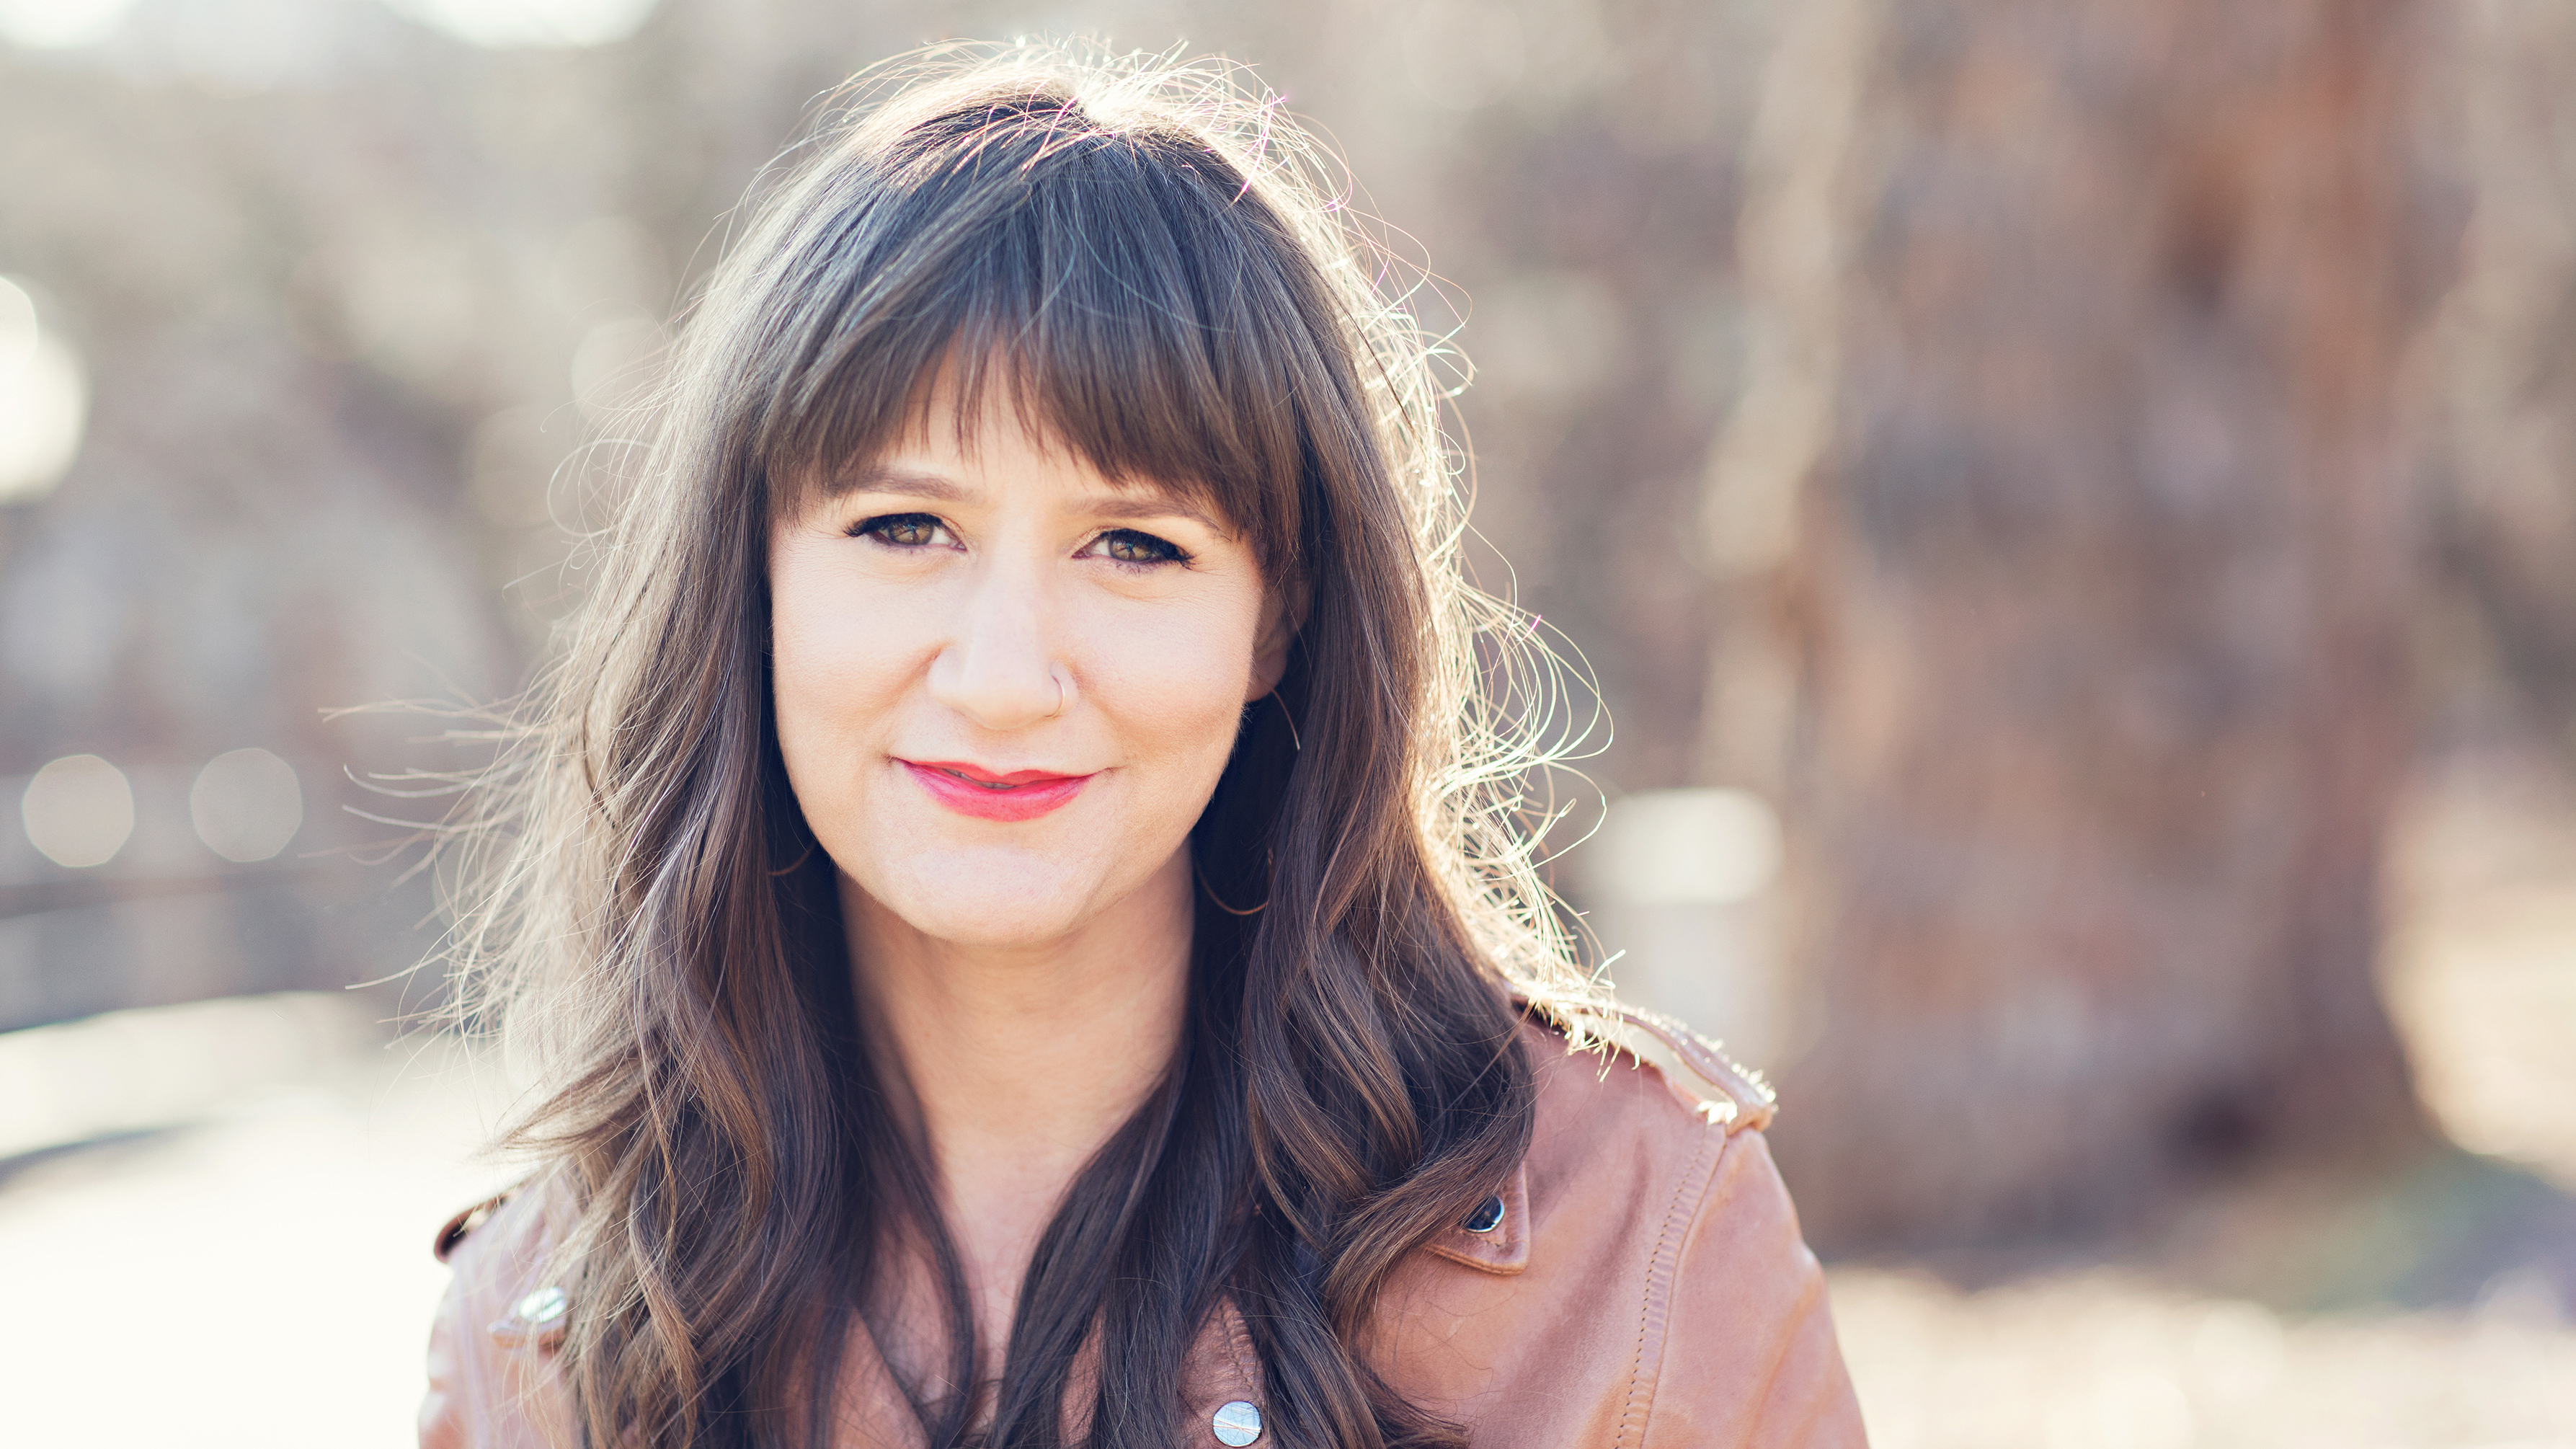 Memoirist: Evangelical Purity Movement Sees Women's Bodies As A 'Threat'